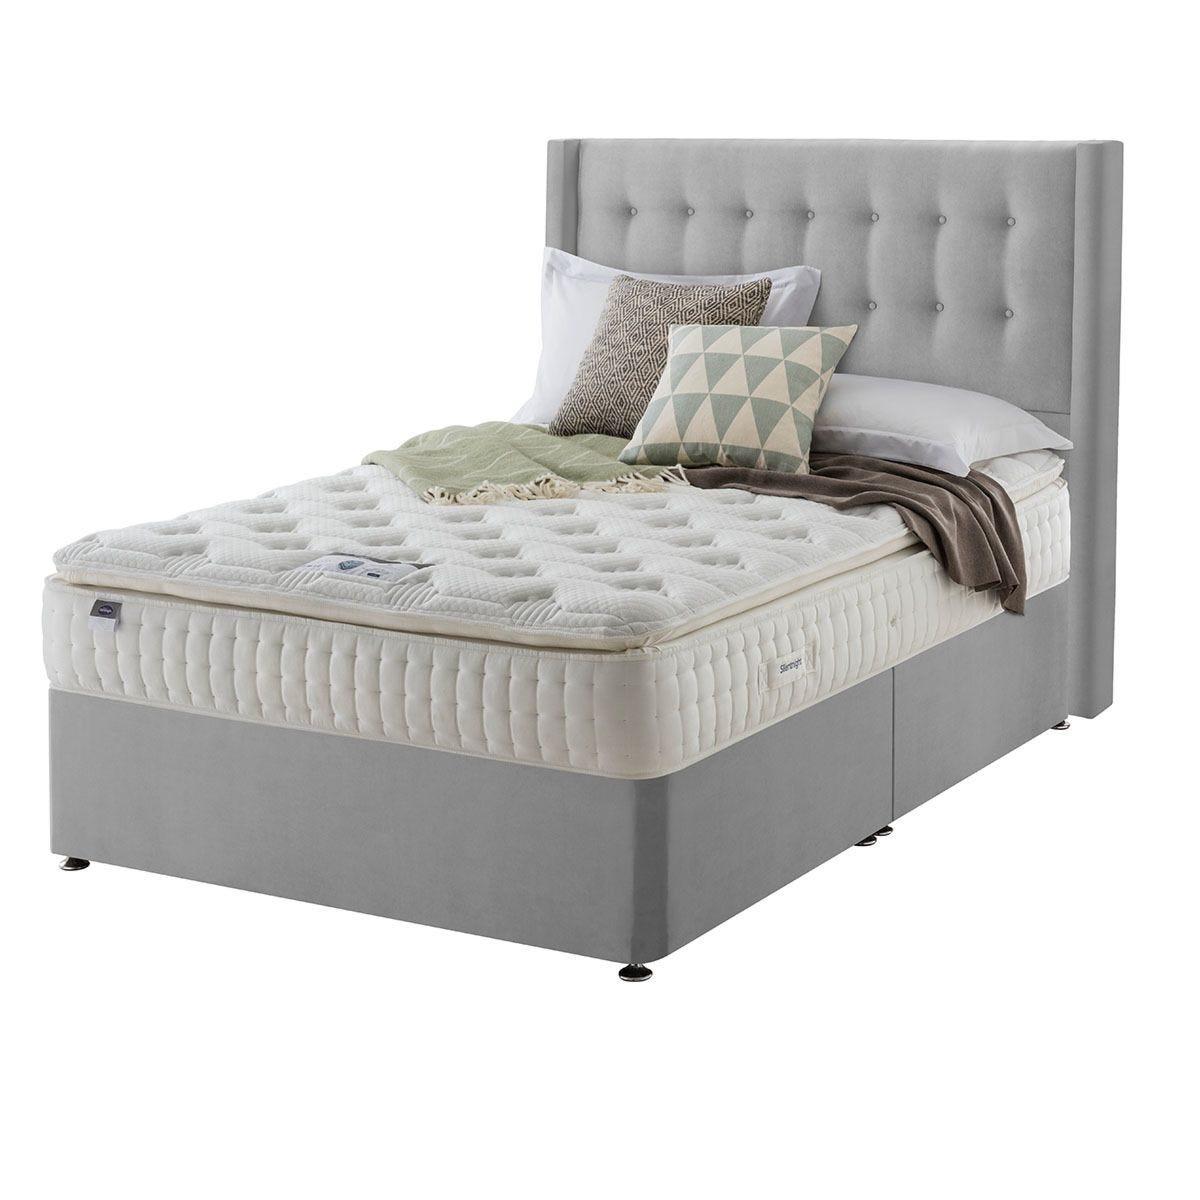 Silentnight Mirapocket Latex 1000 Non Storage Divan Bed - Velvet Silver Super King